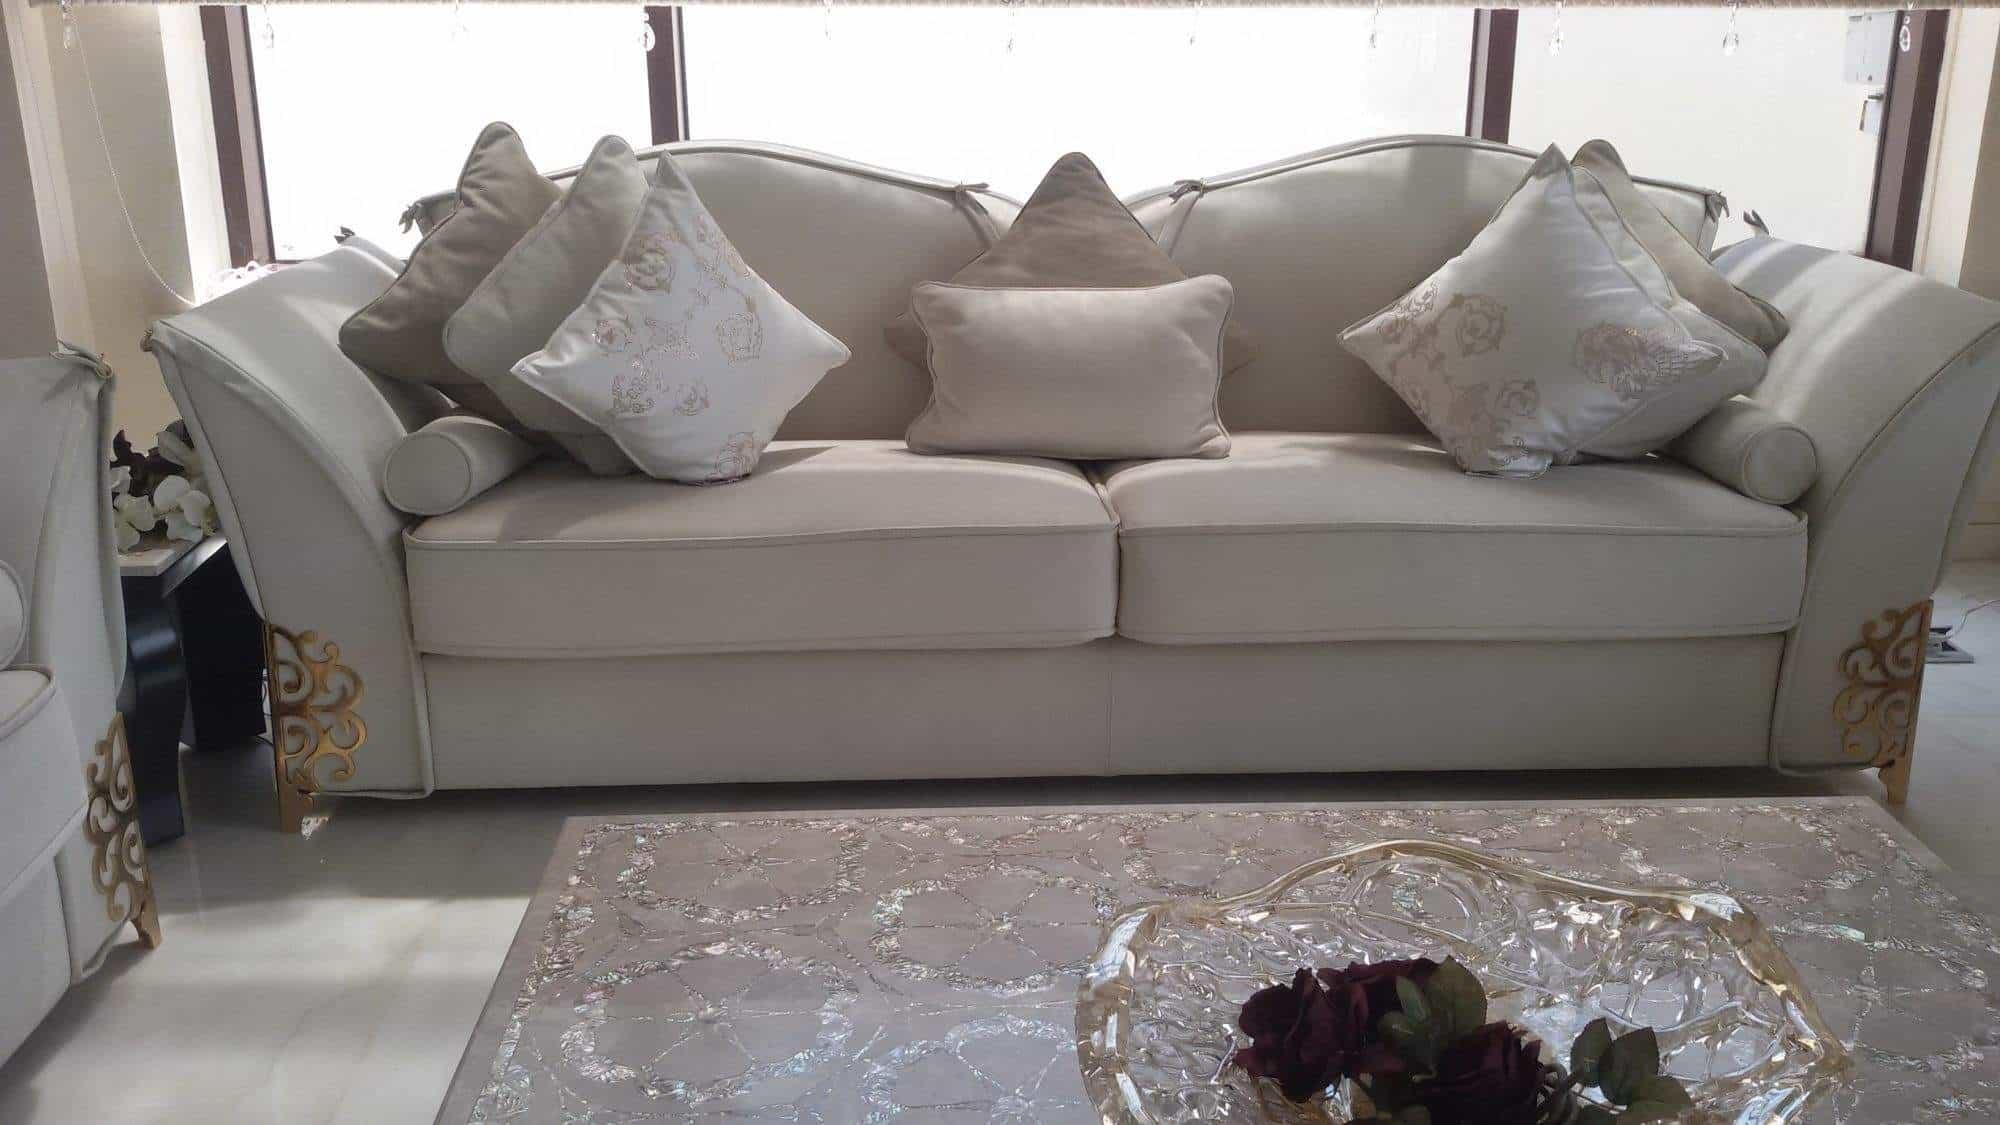 White Star Sofa Works Mehdipatnam Sofa Set Repair & Services in